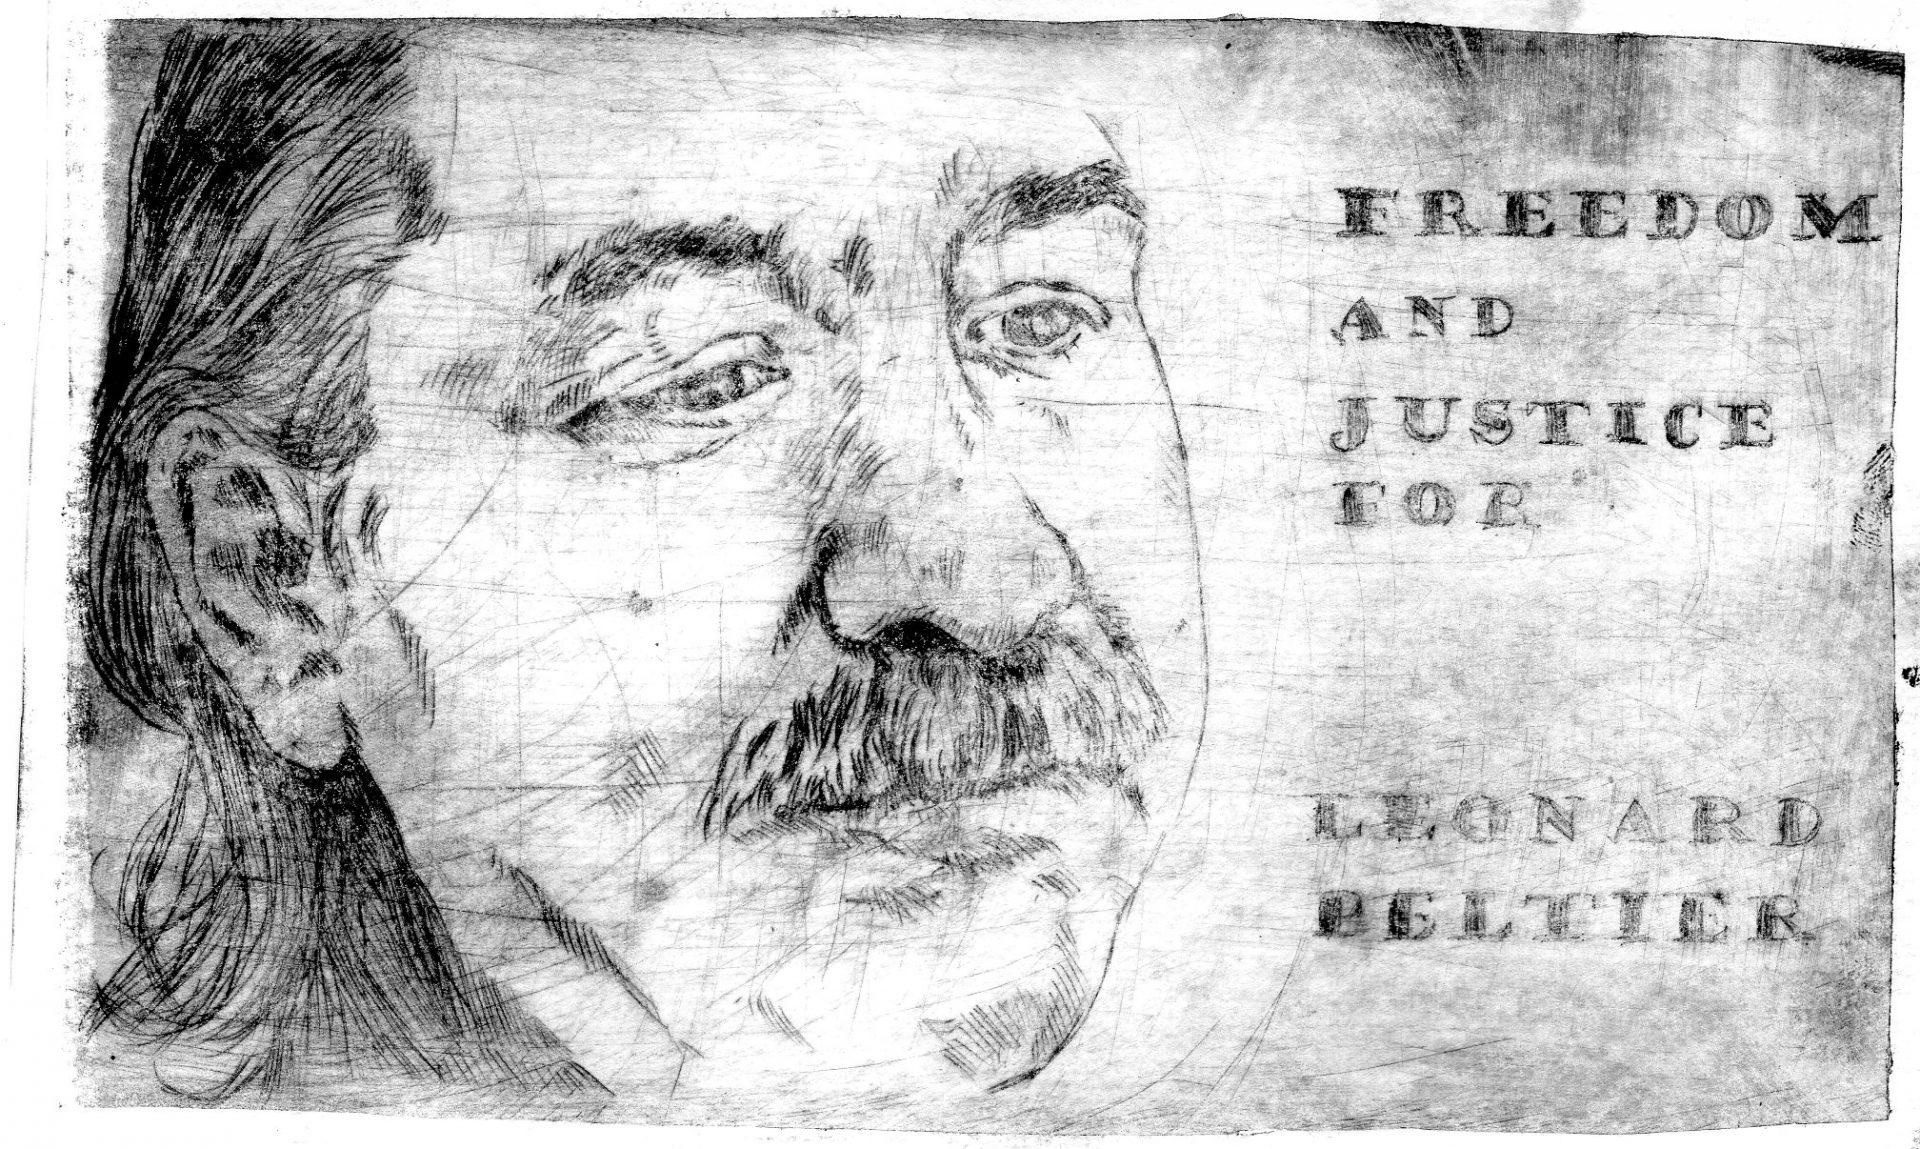 17.7.2020: Mahnwache für Leonard Peltier, Mumia Abu-Jamal u.a. politische US-Langzeitgefangene in Frankfurt am Main